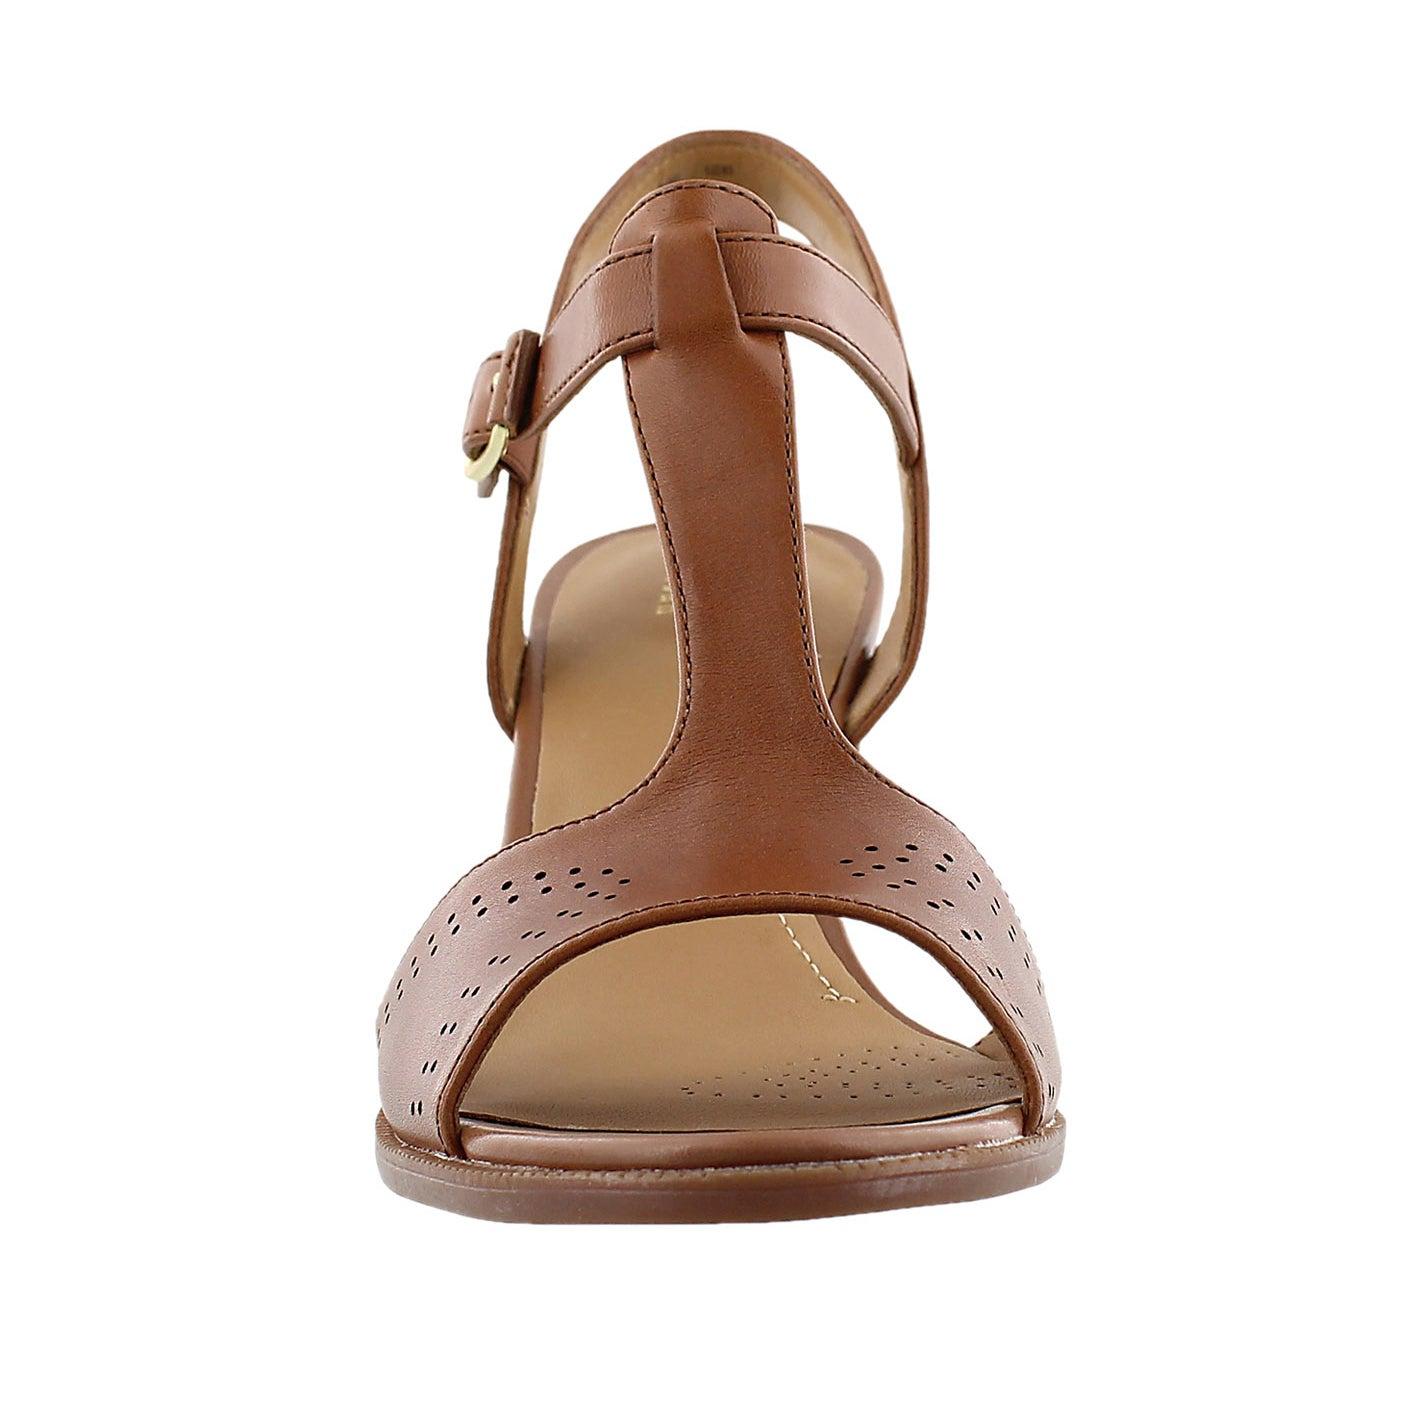 Sandale habillée Ciera Glass, brun, fem